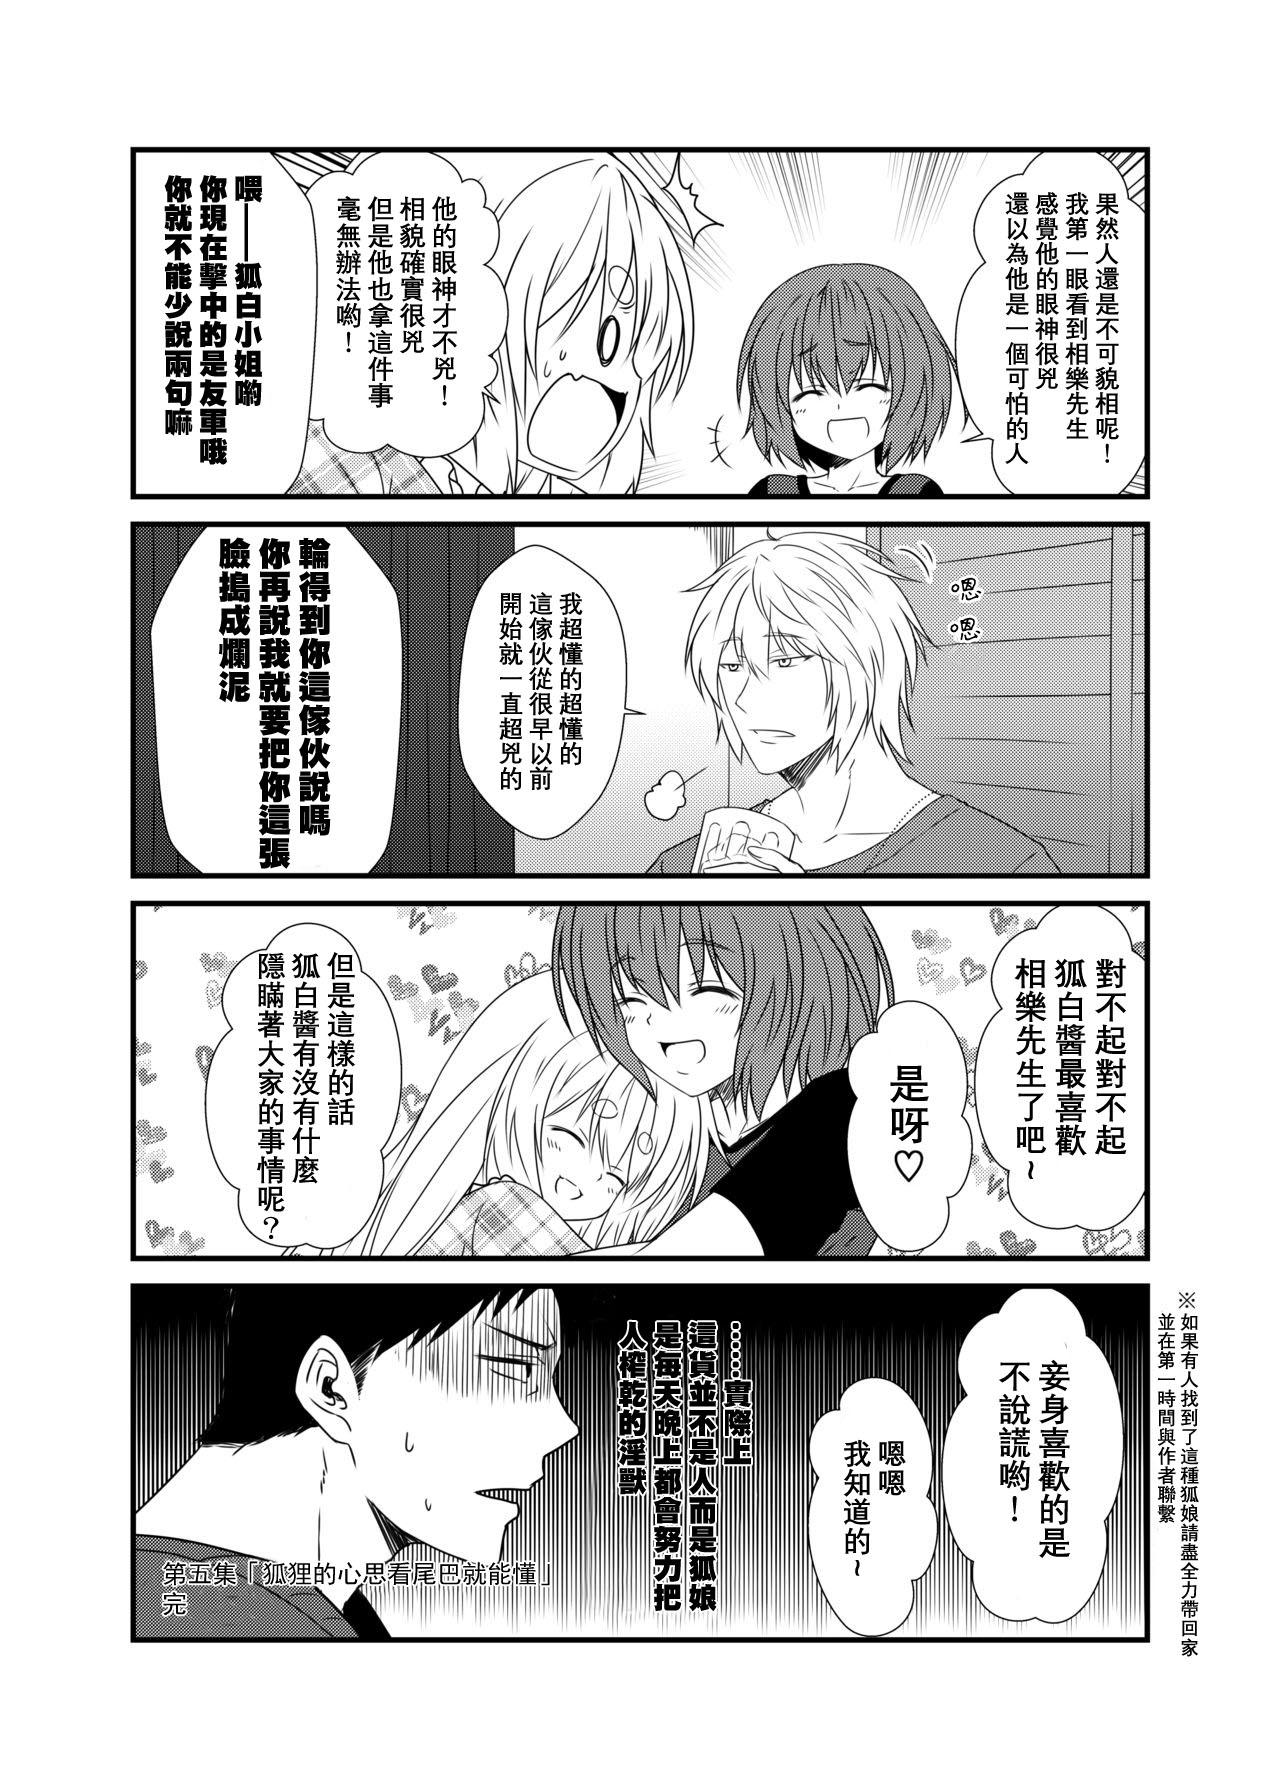 Kohaku Biyori Vol. 5 20